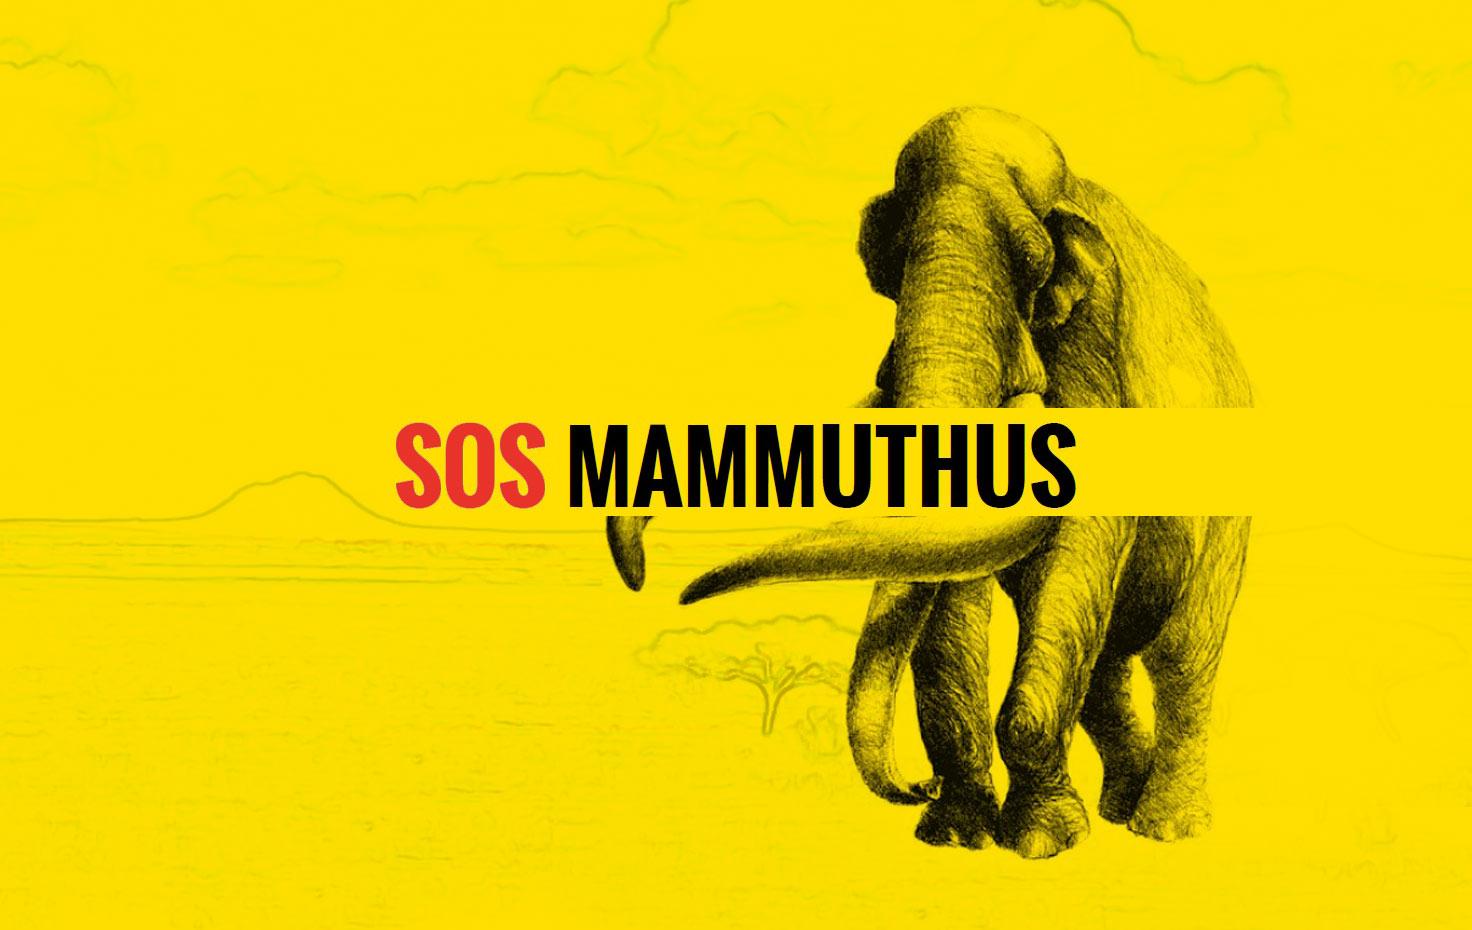 sos mammuthus